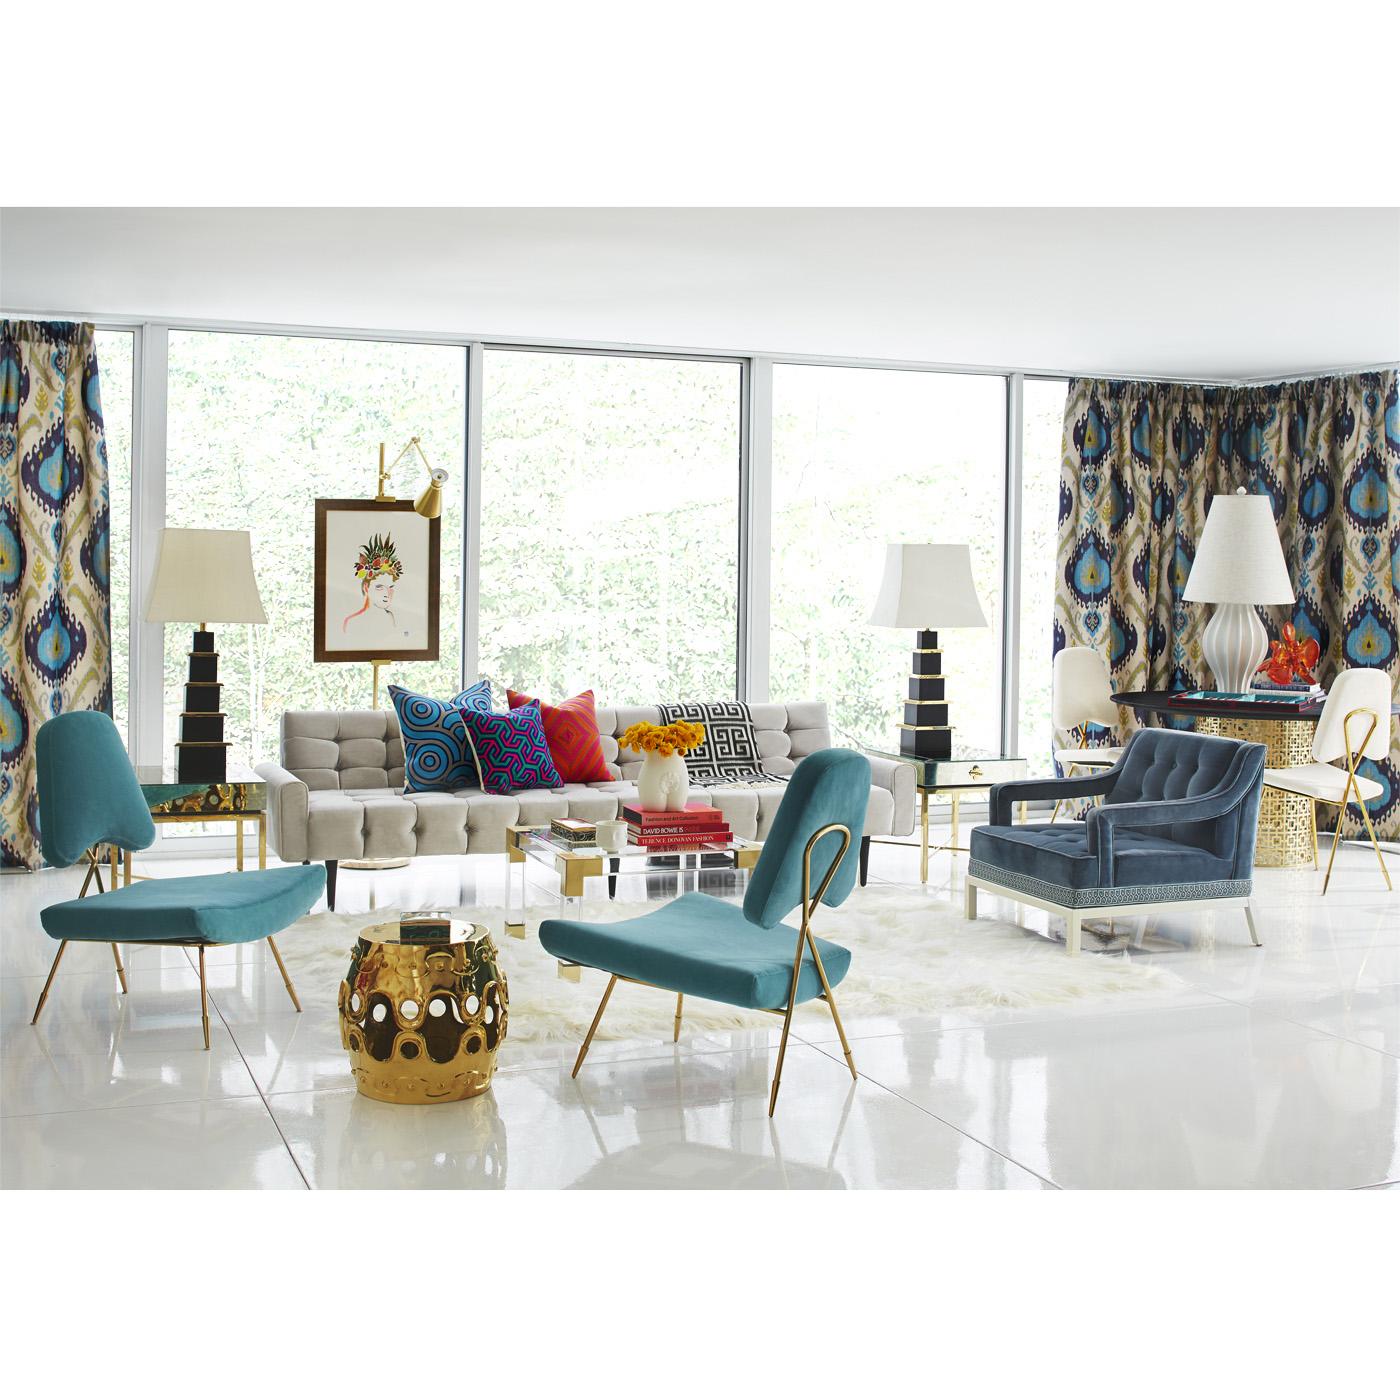 Jonathan adler spring 2014 stellar interior design for Jonathan adler interior design